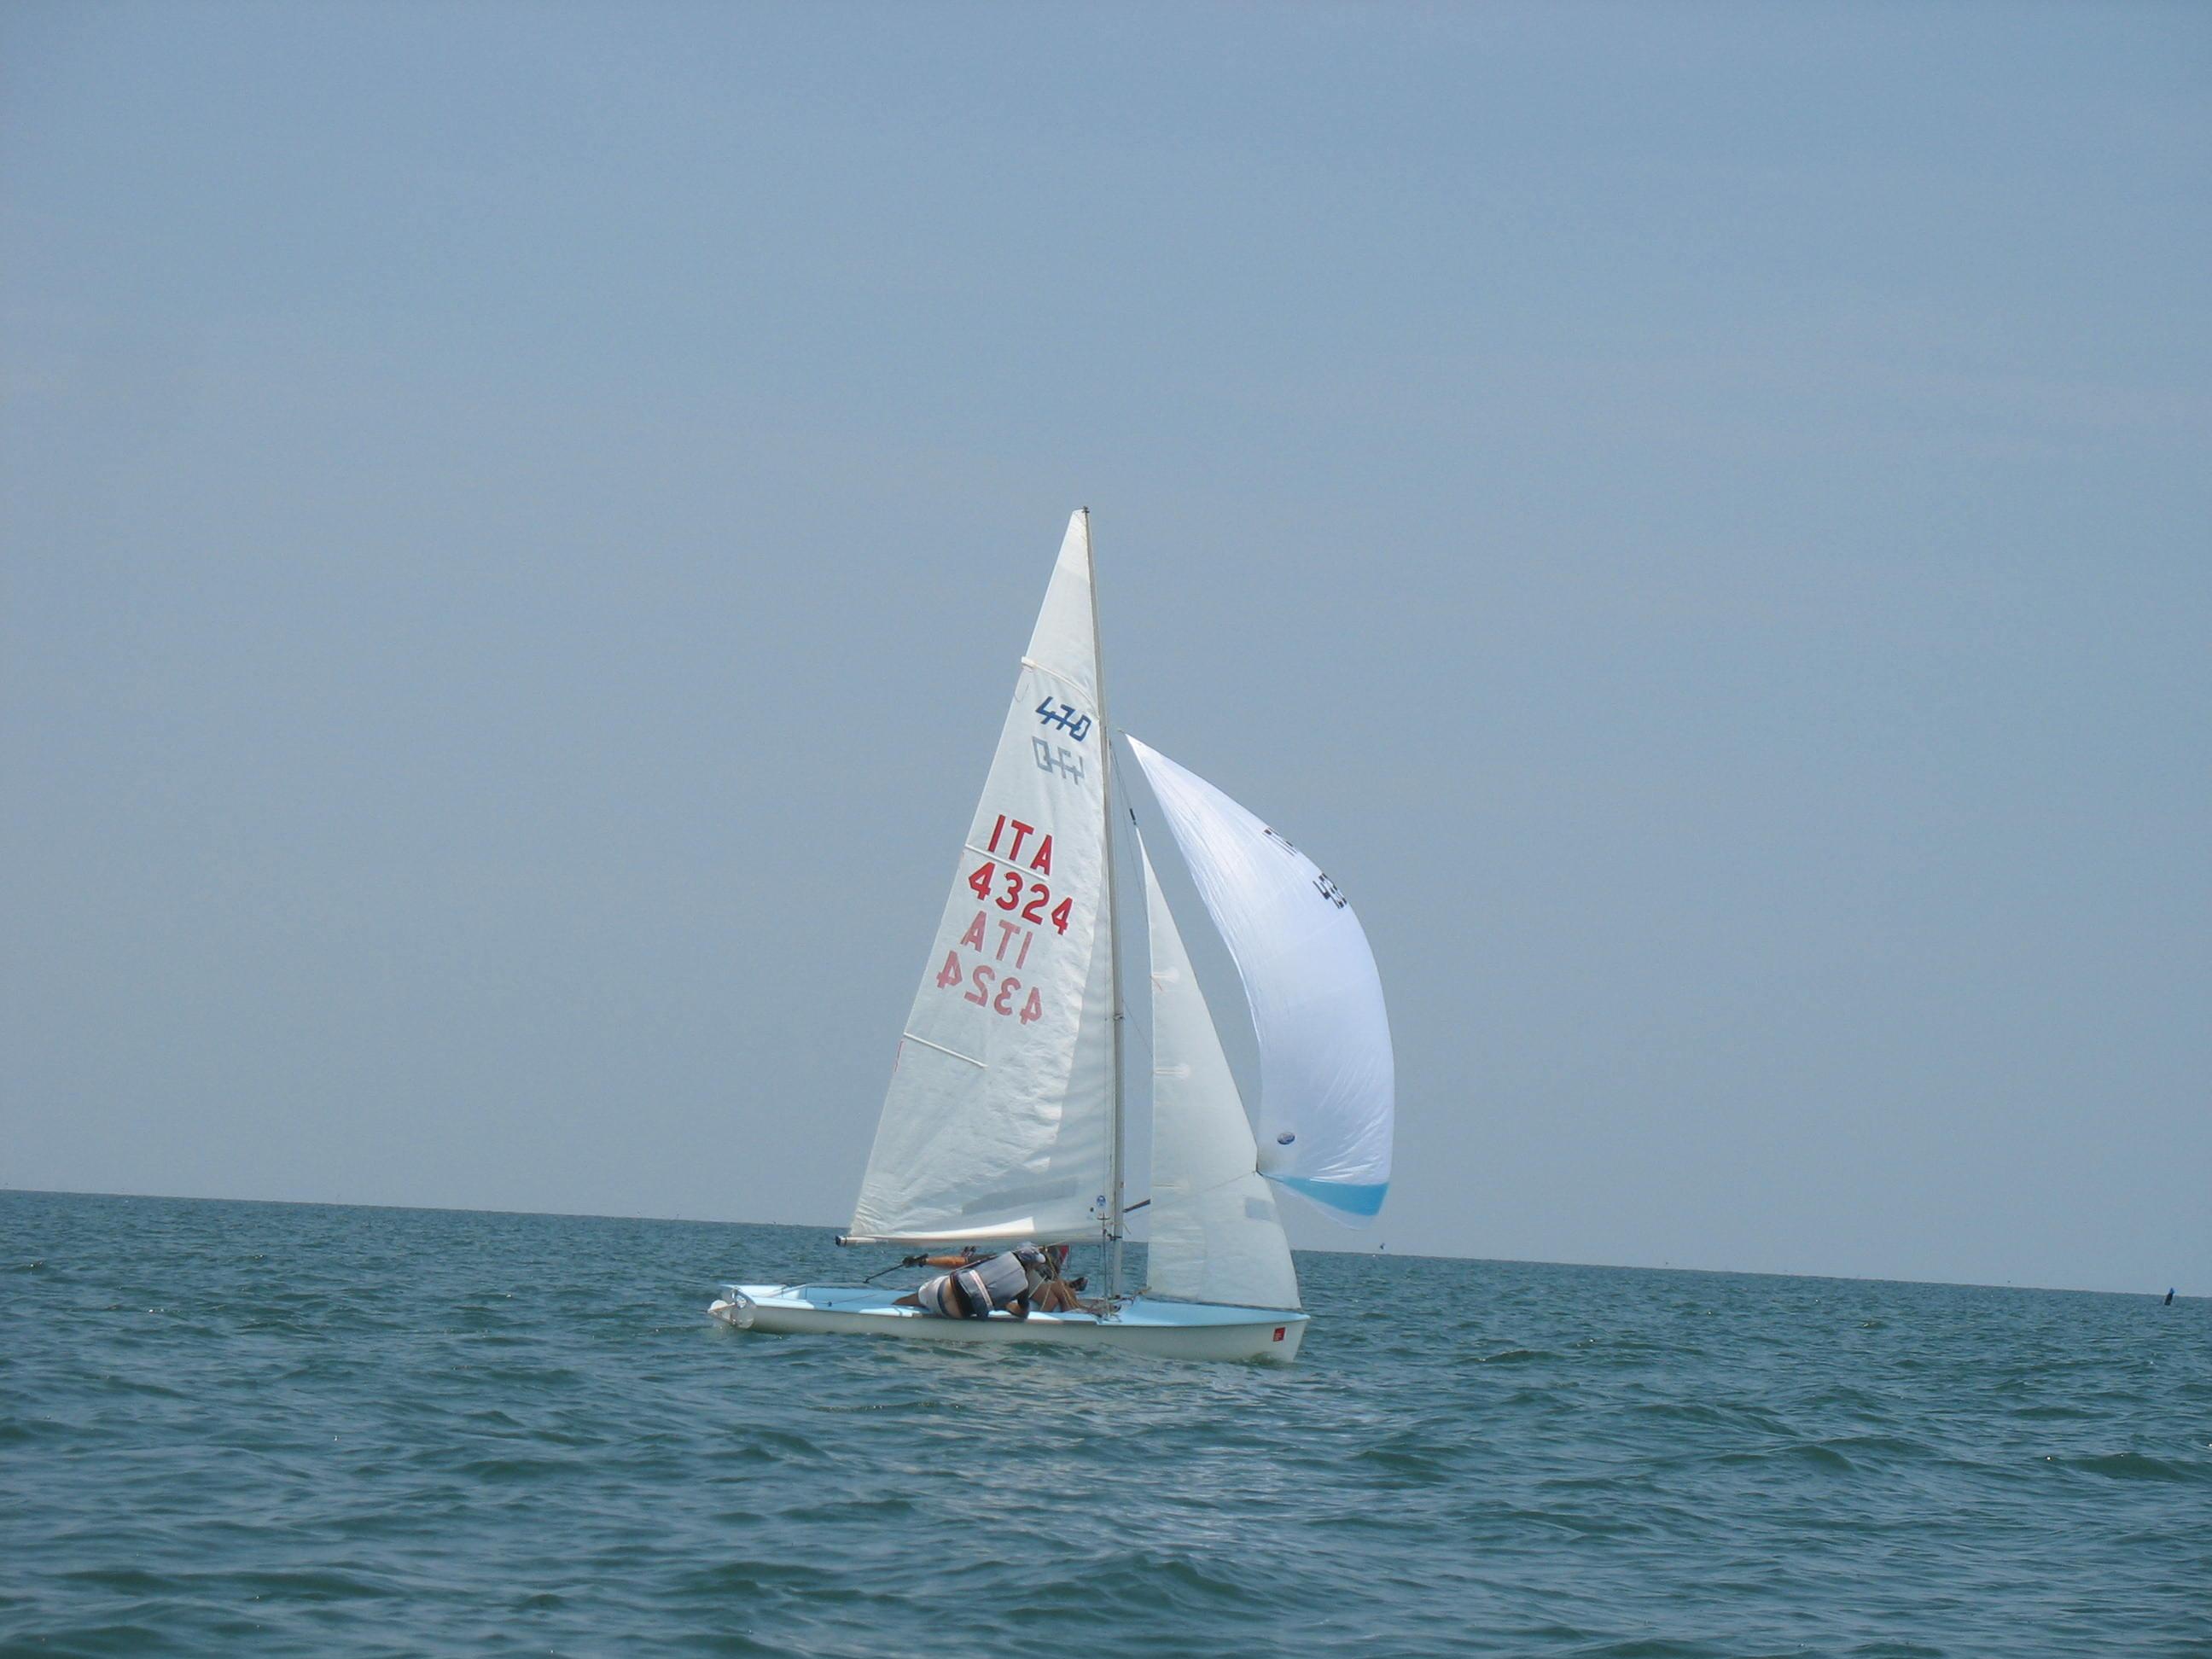 5-torneo-elia-tonelli-27062010-056